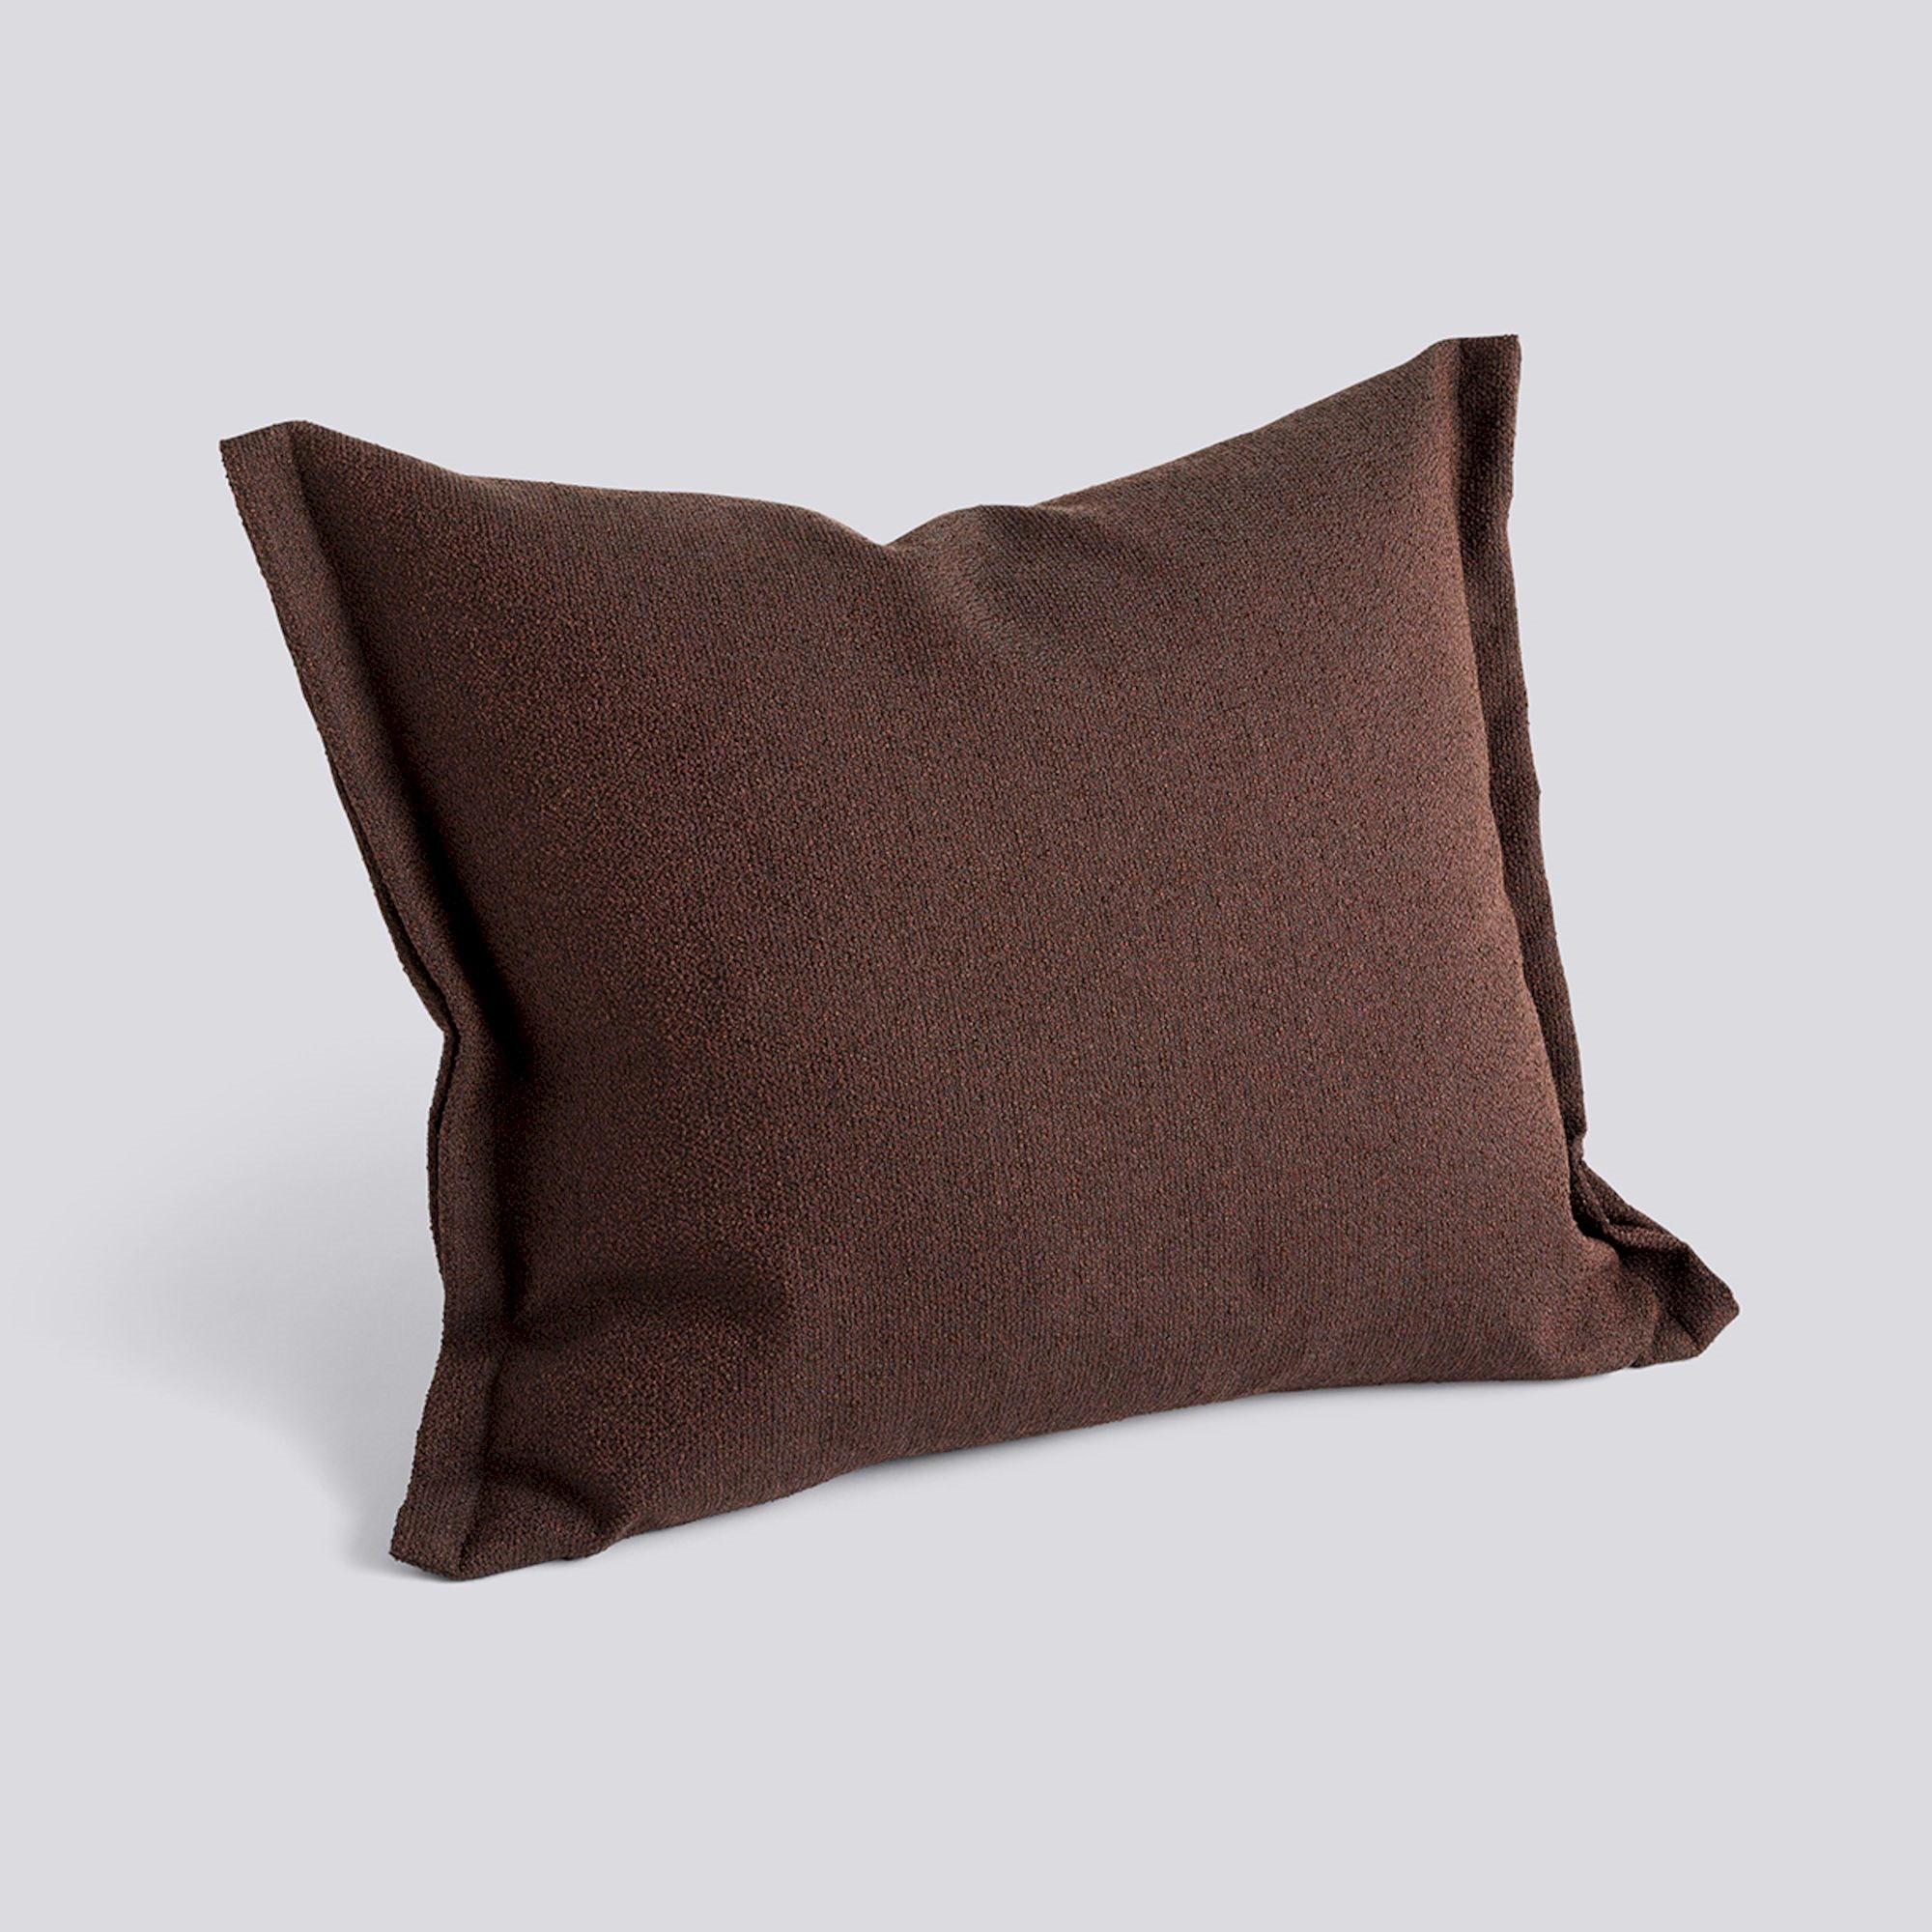 HAY Cushion Plica Sprinkle Bordeaux